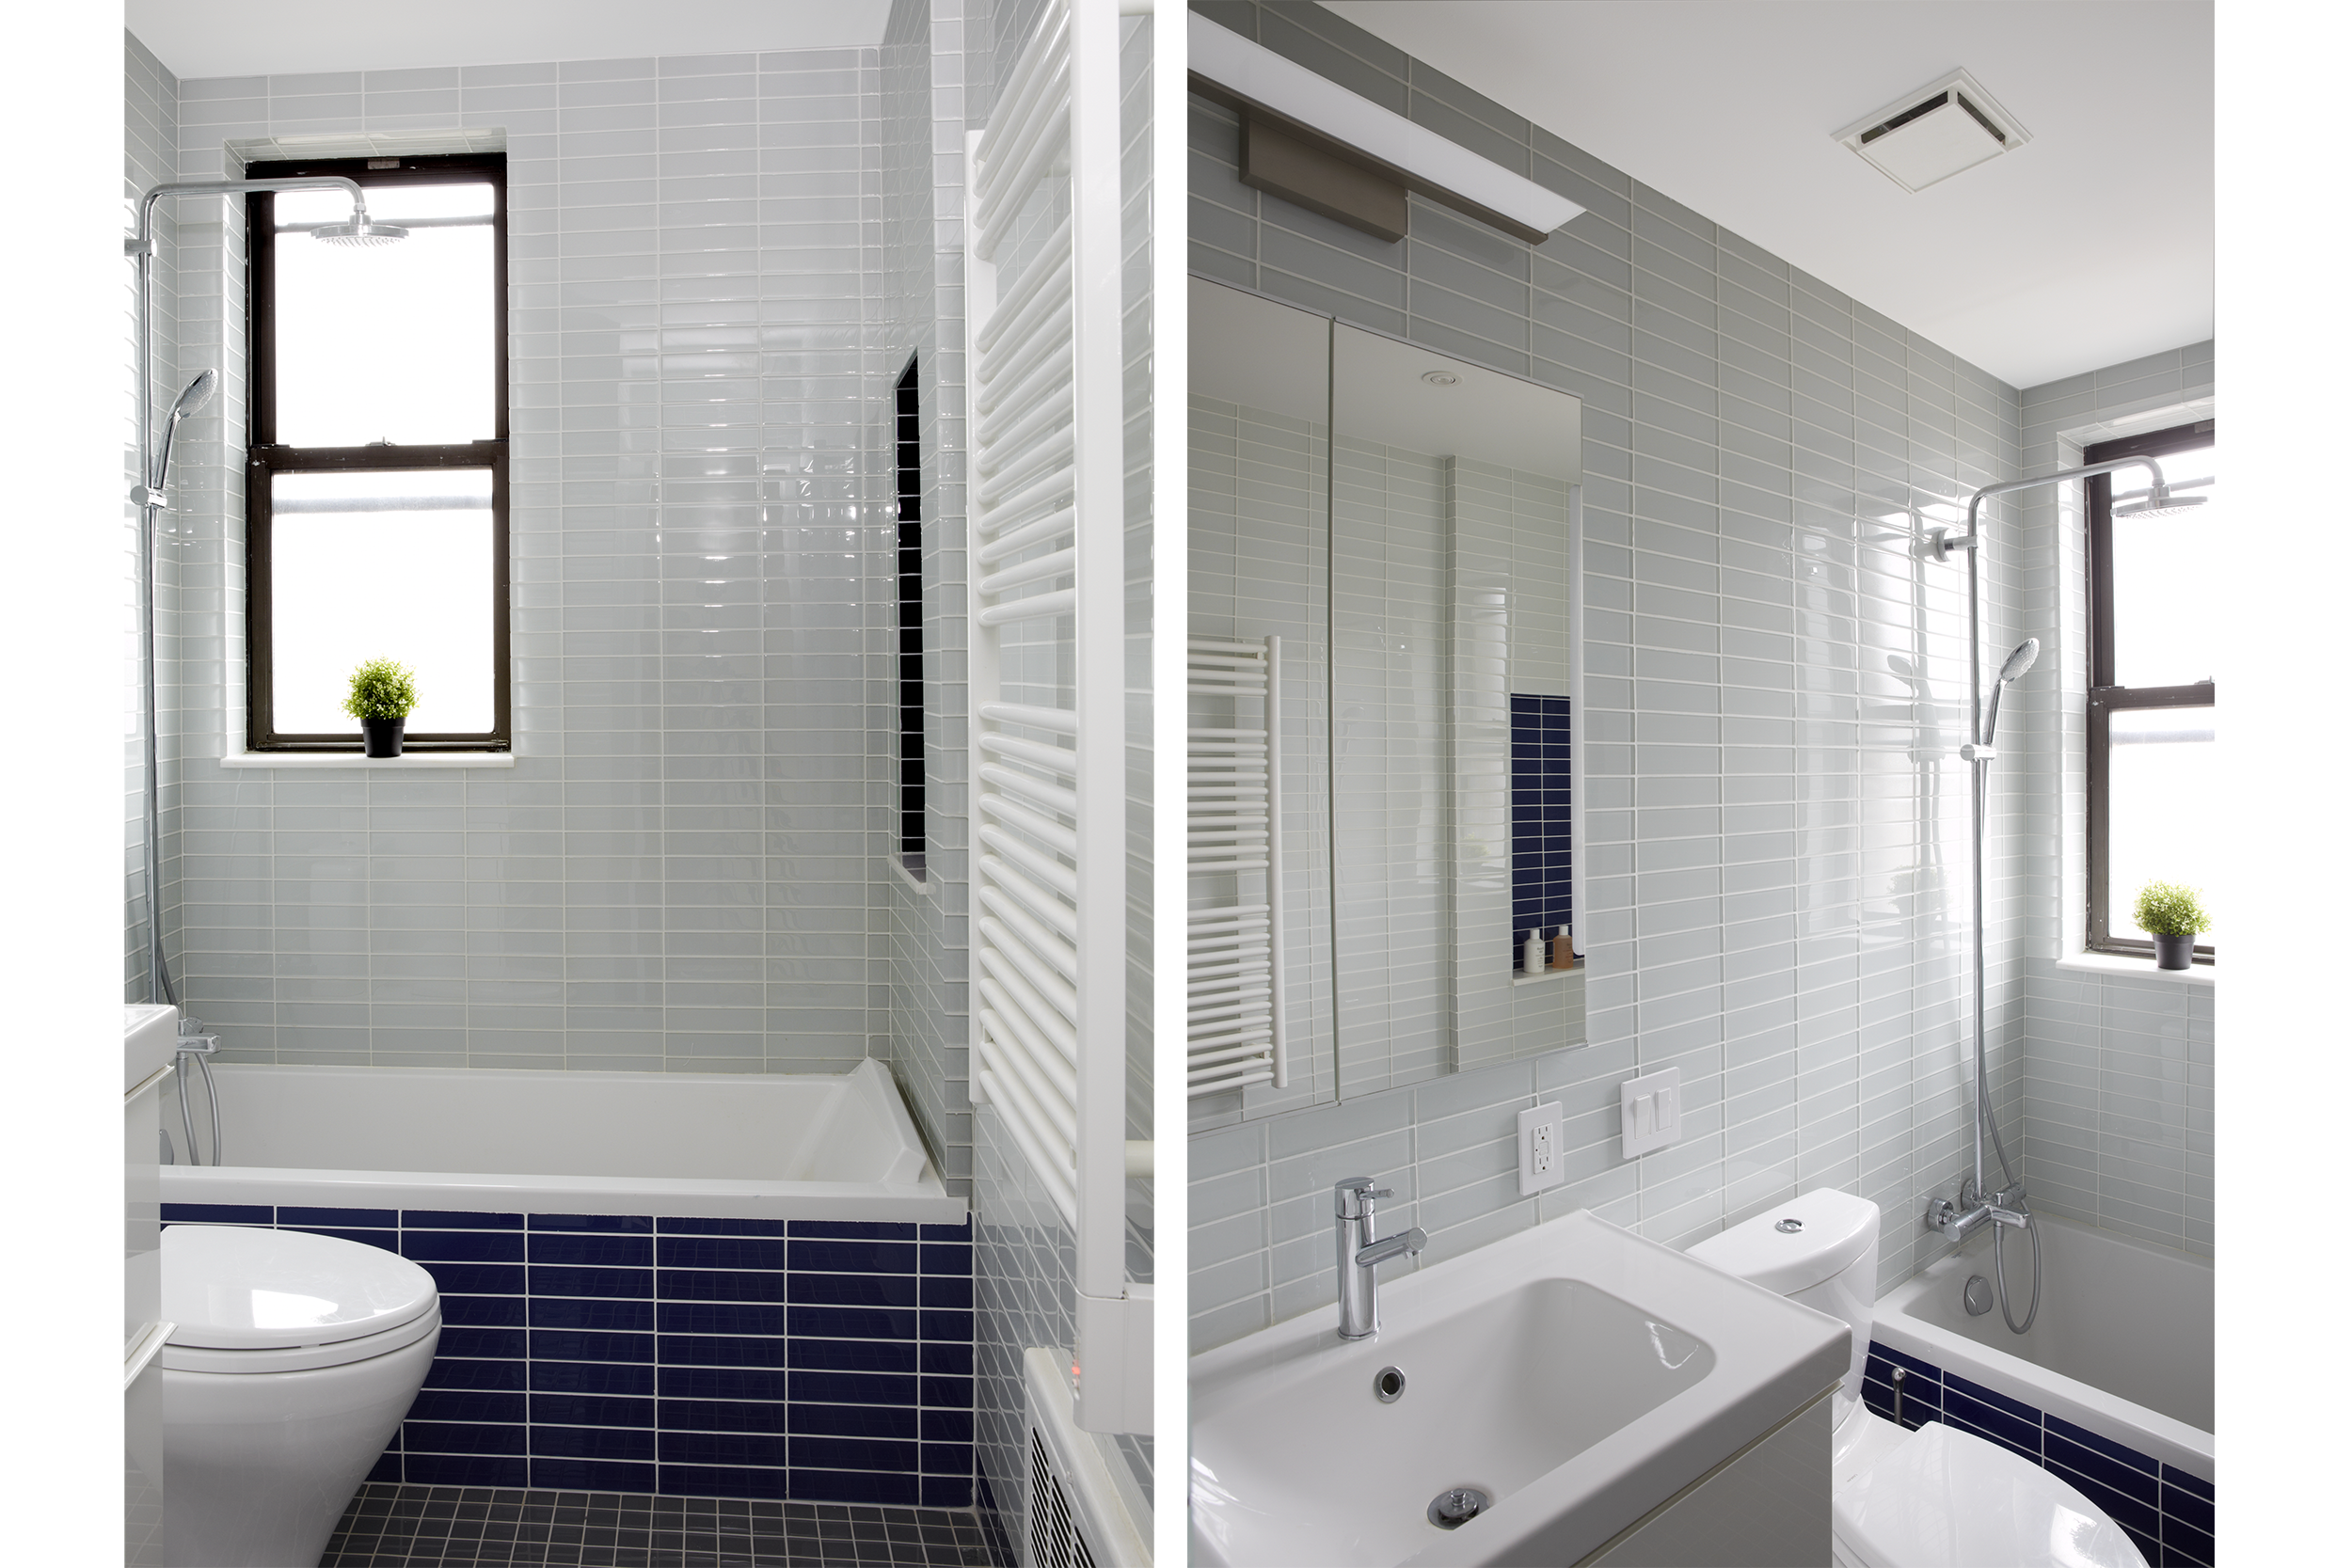 AA64_315_StJohn_bathroom(small).png